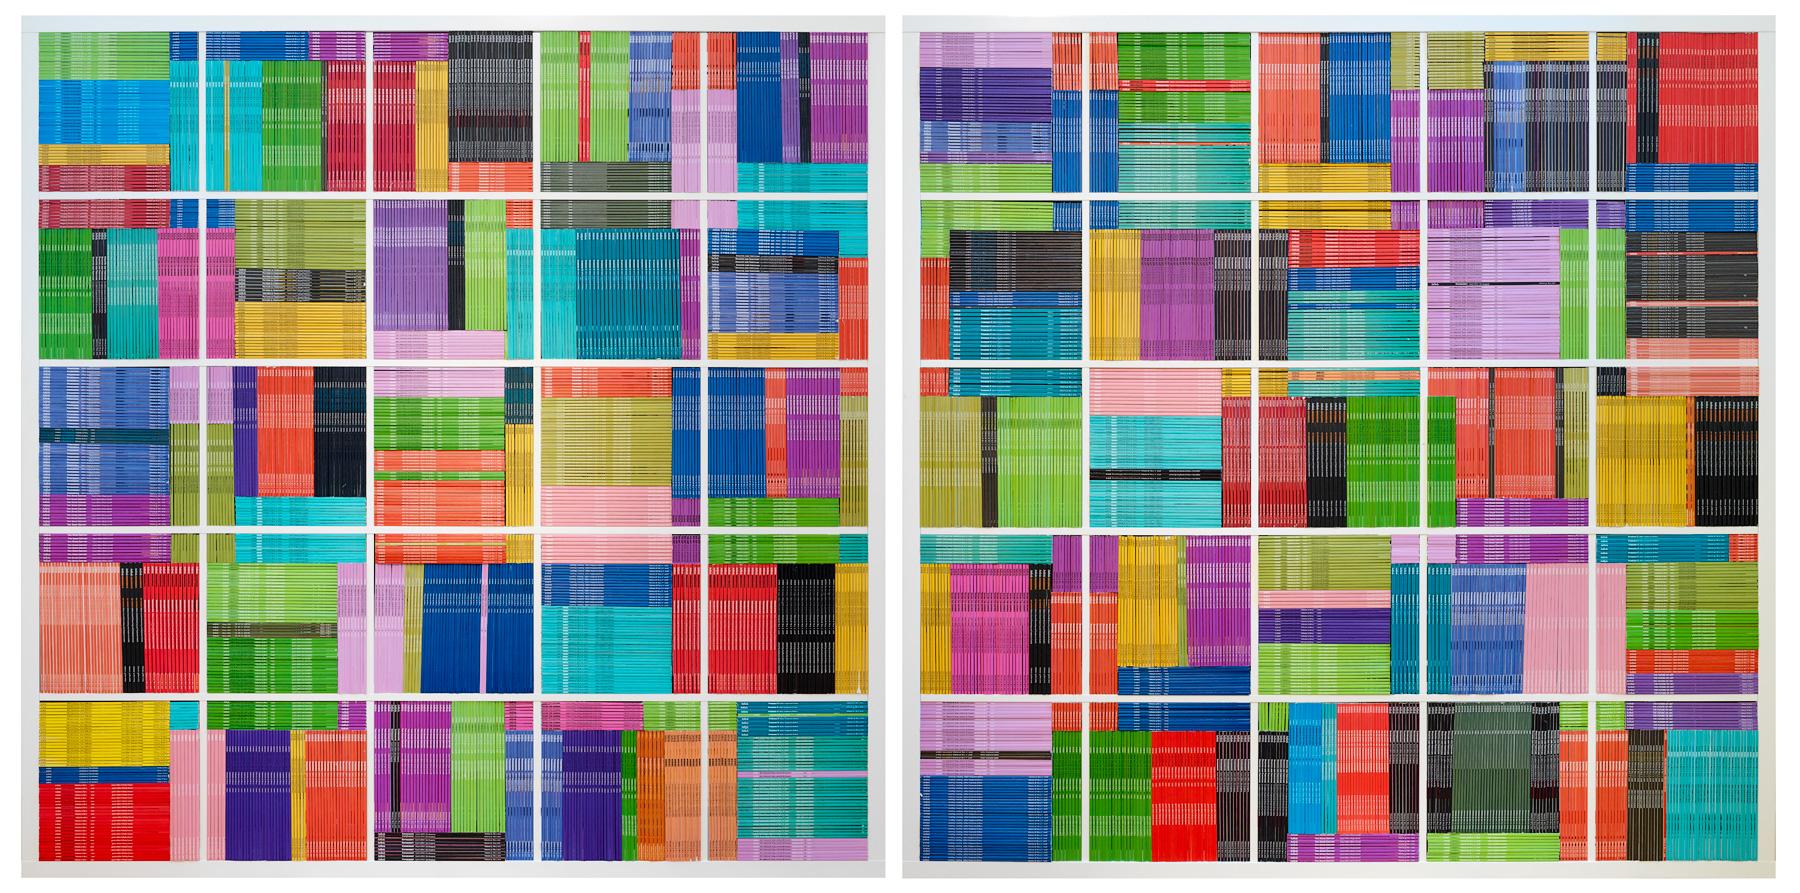 Complexity Theory   2018  182 x 182 x 39cm (each unit)  discarded artlink magazines, mass produced IKEA bookshelves  Photographer Grant Hancock